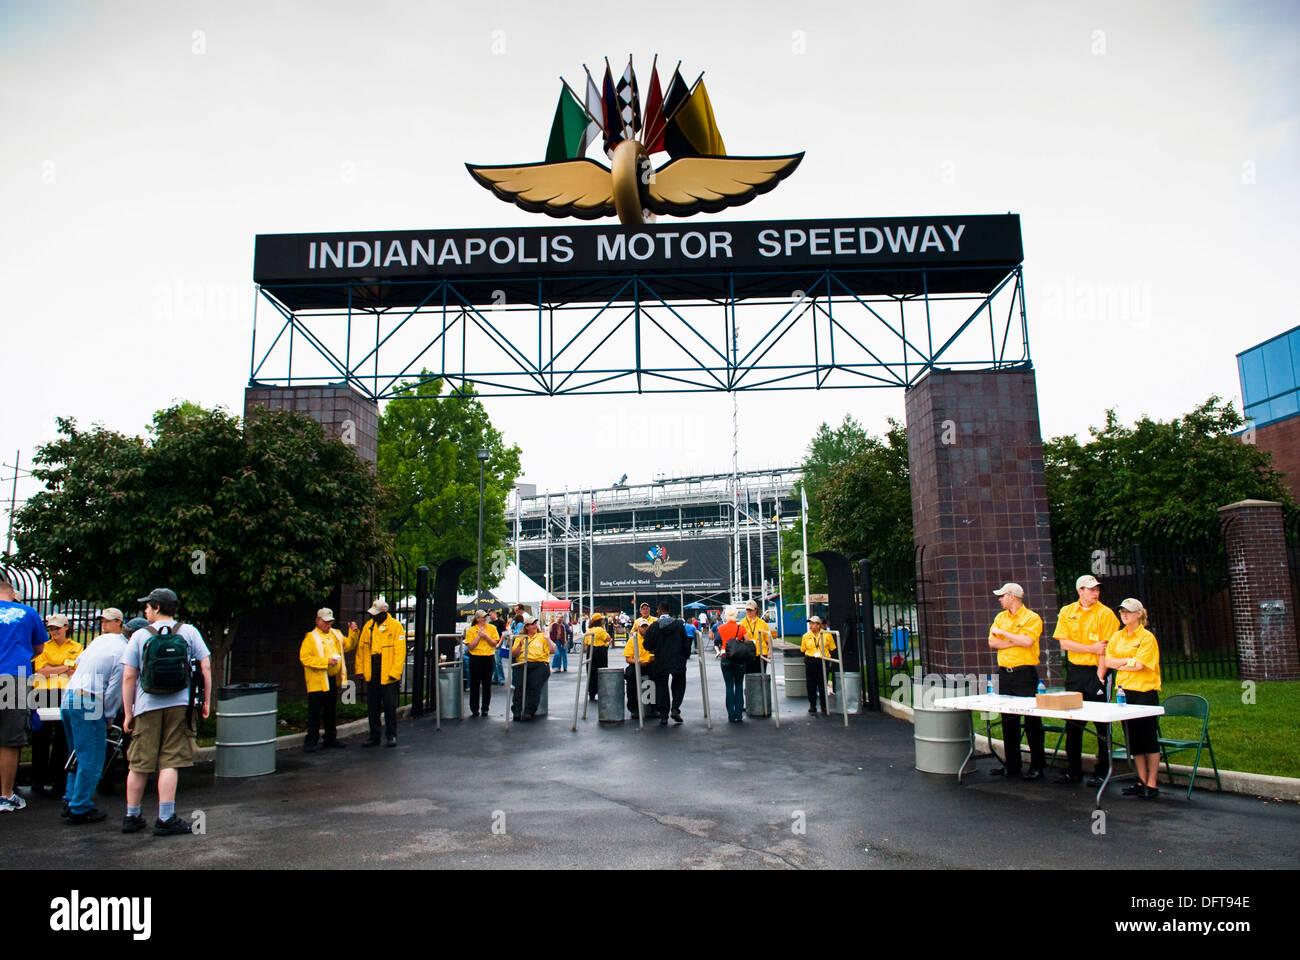 Indy 500 date in Melbourne